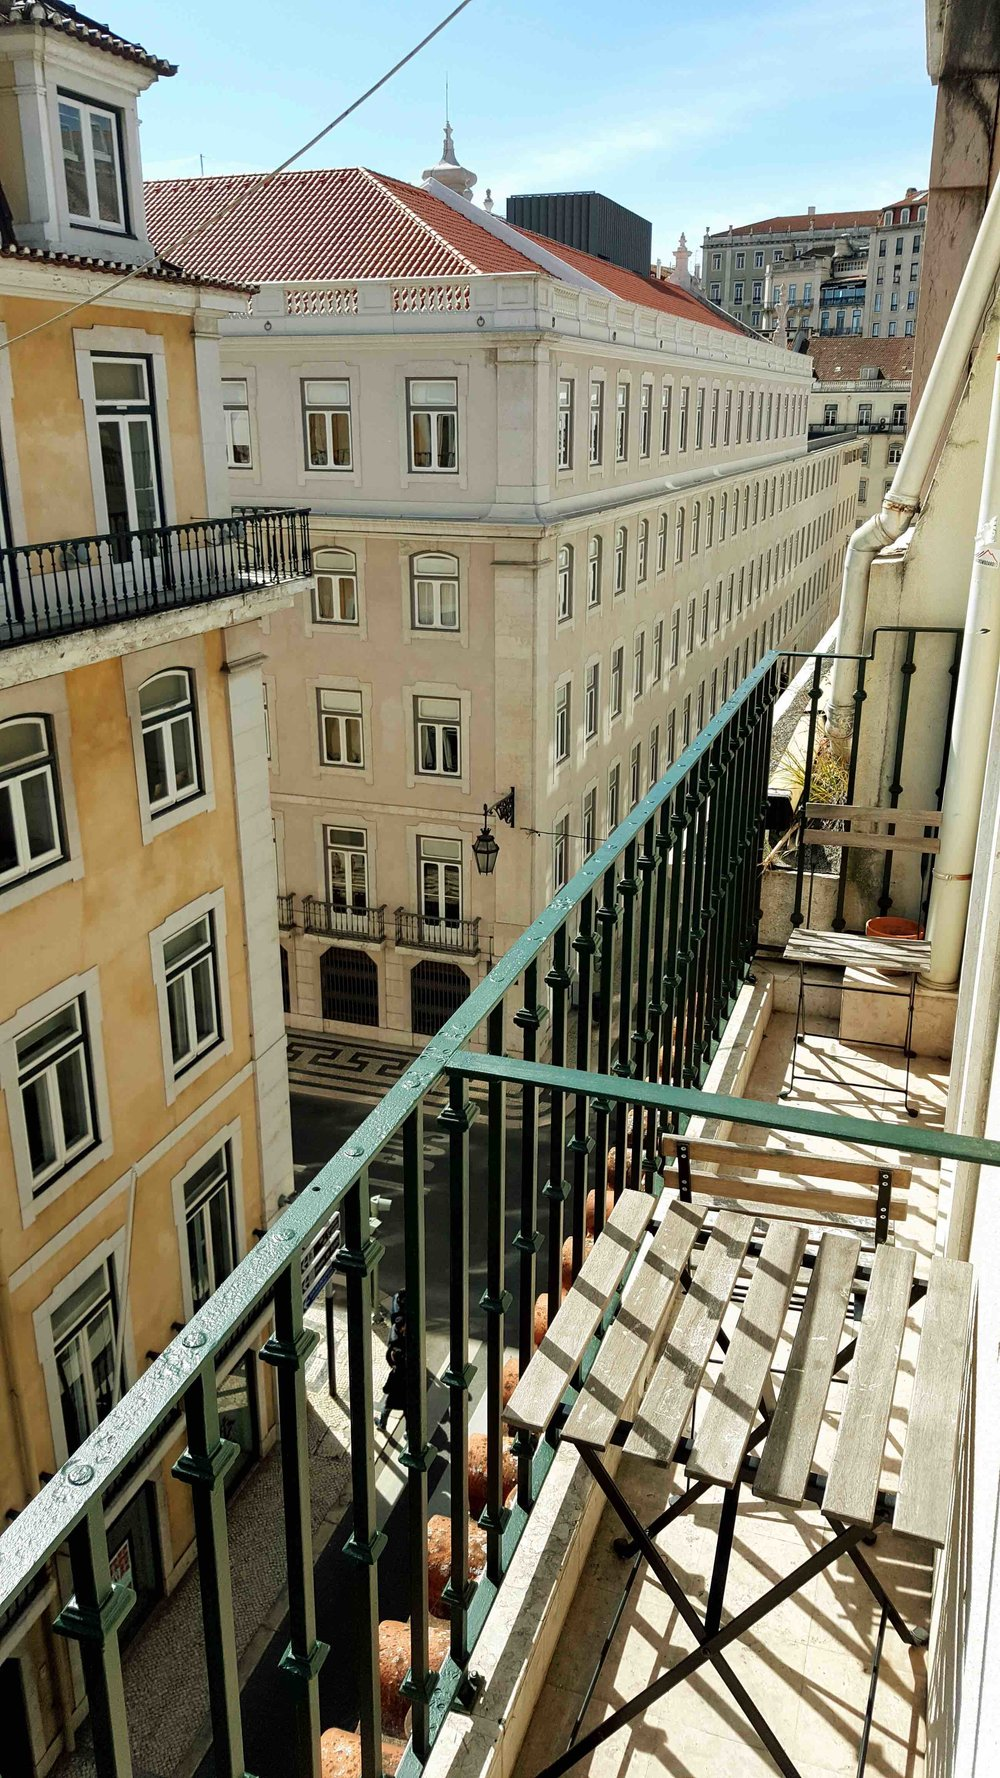 Hostel em Lisboa por Joana Balaguer 20.jpg